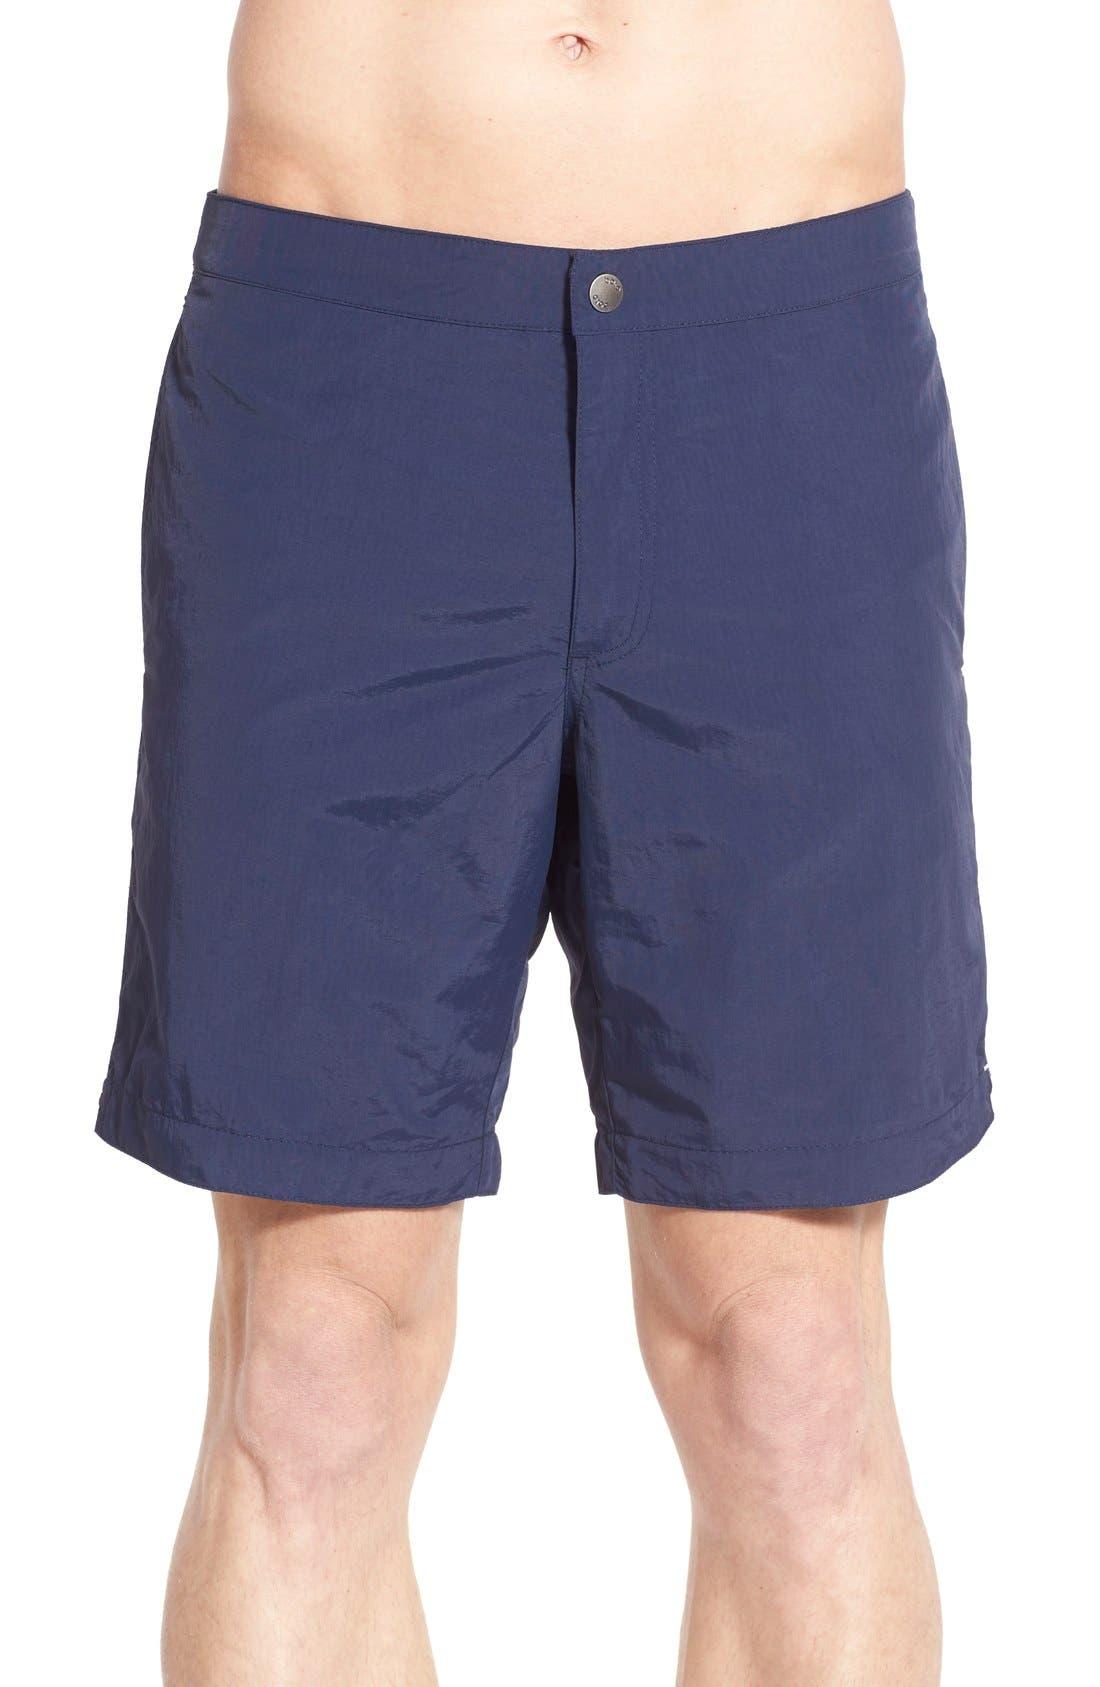 Main Image - boto Aruba Tailored Fit 8.5 Inch Swim Trunks